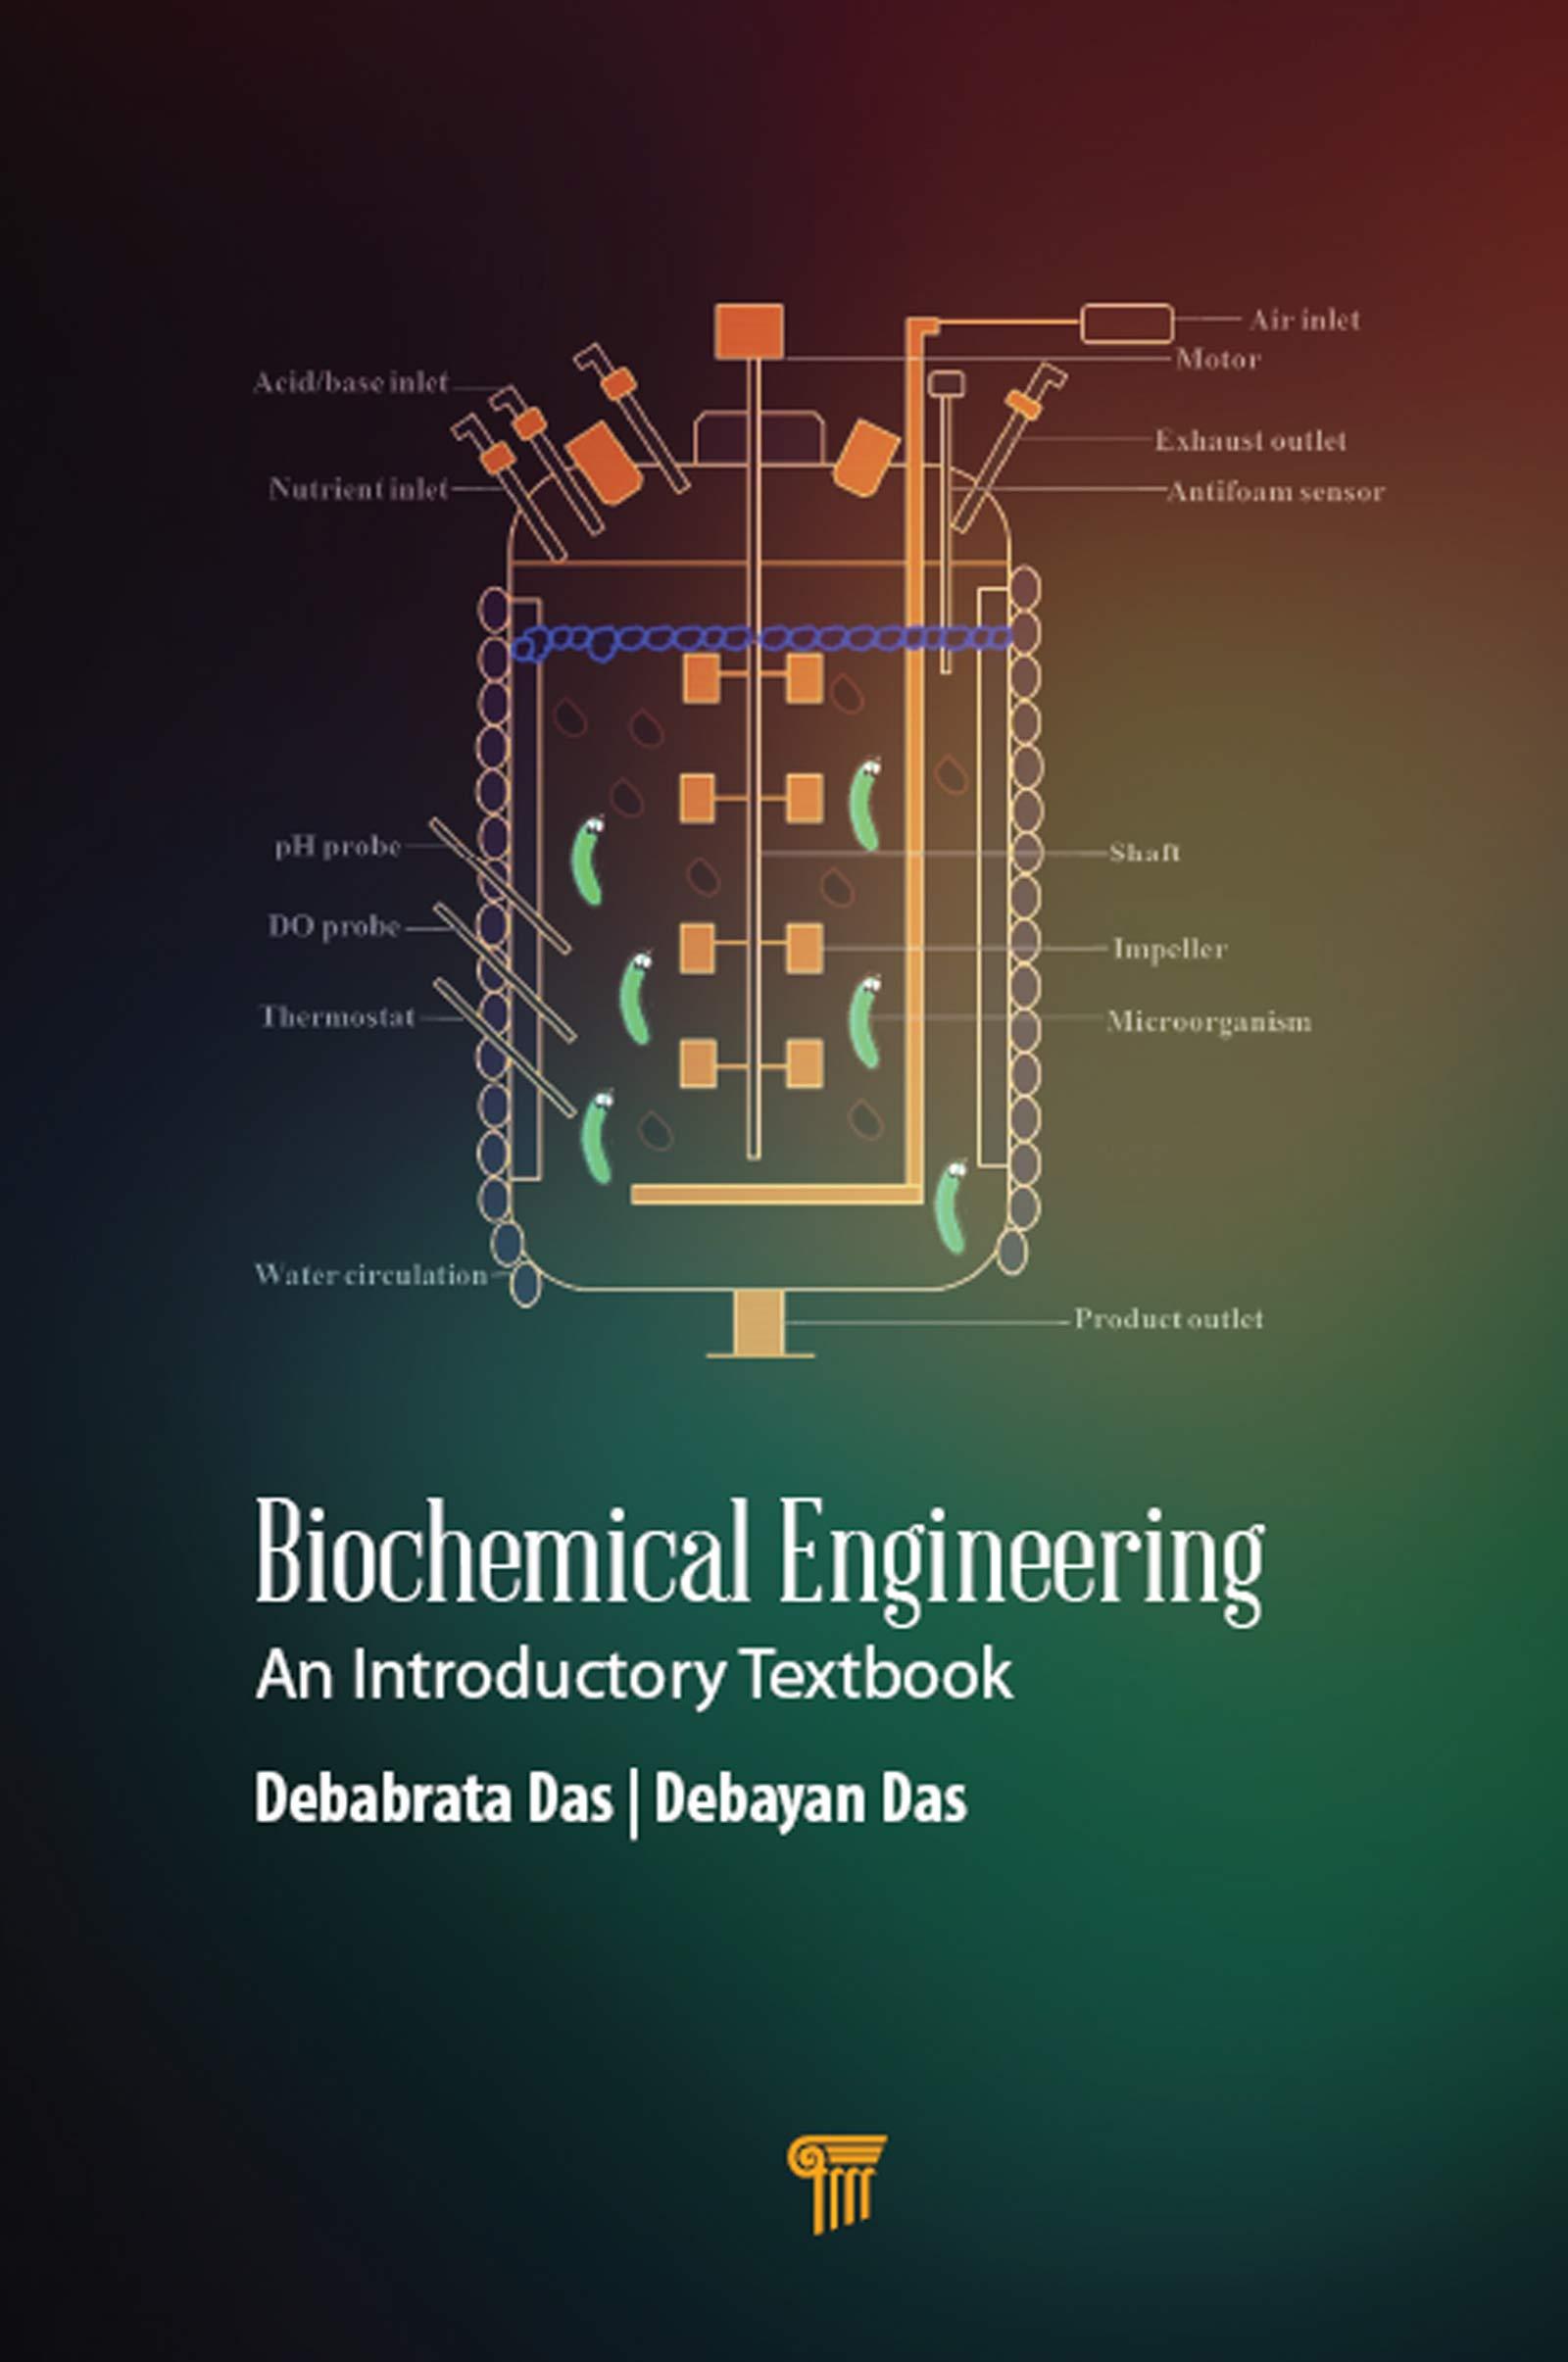 Biochemical Engineering An Introductory Textbook 1 Das Debabrata Das Debayan Amazon Com